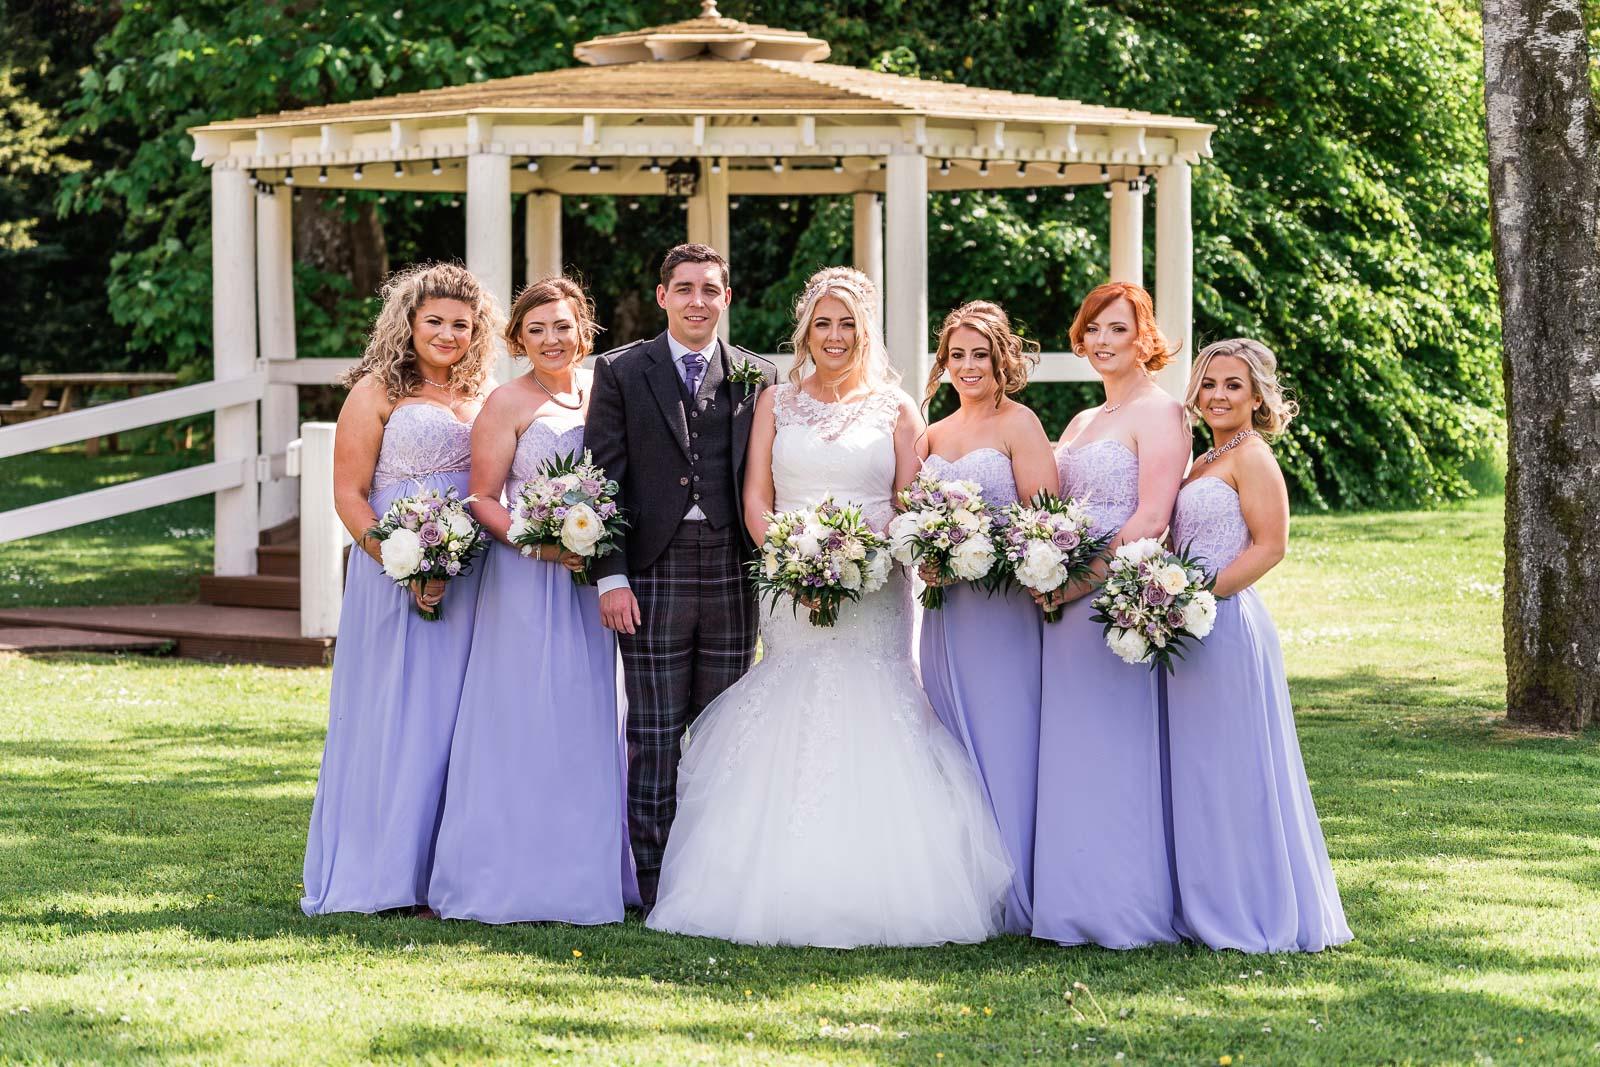 cornhill_castle_wedding_biggar_dearlyphotography (176 of 448).jpg